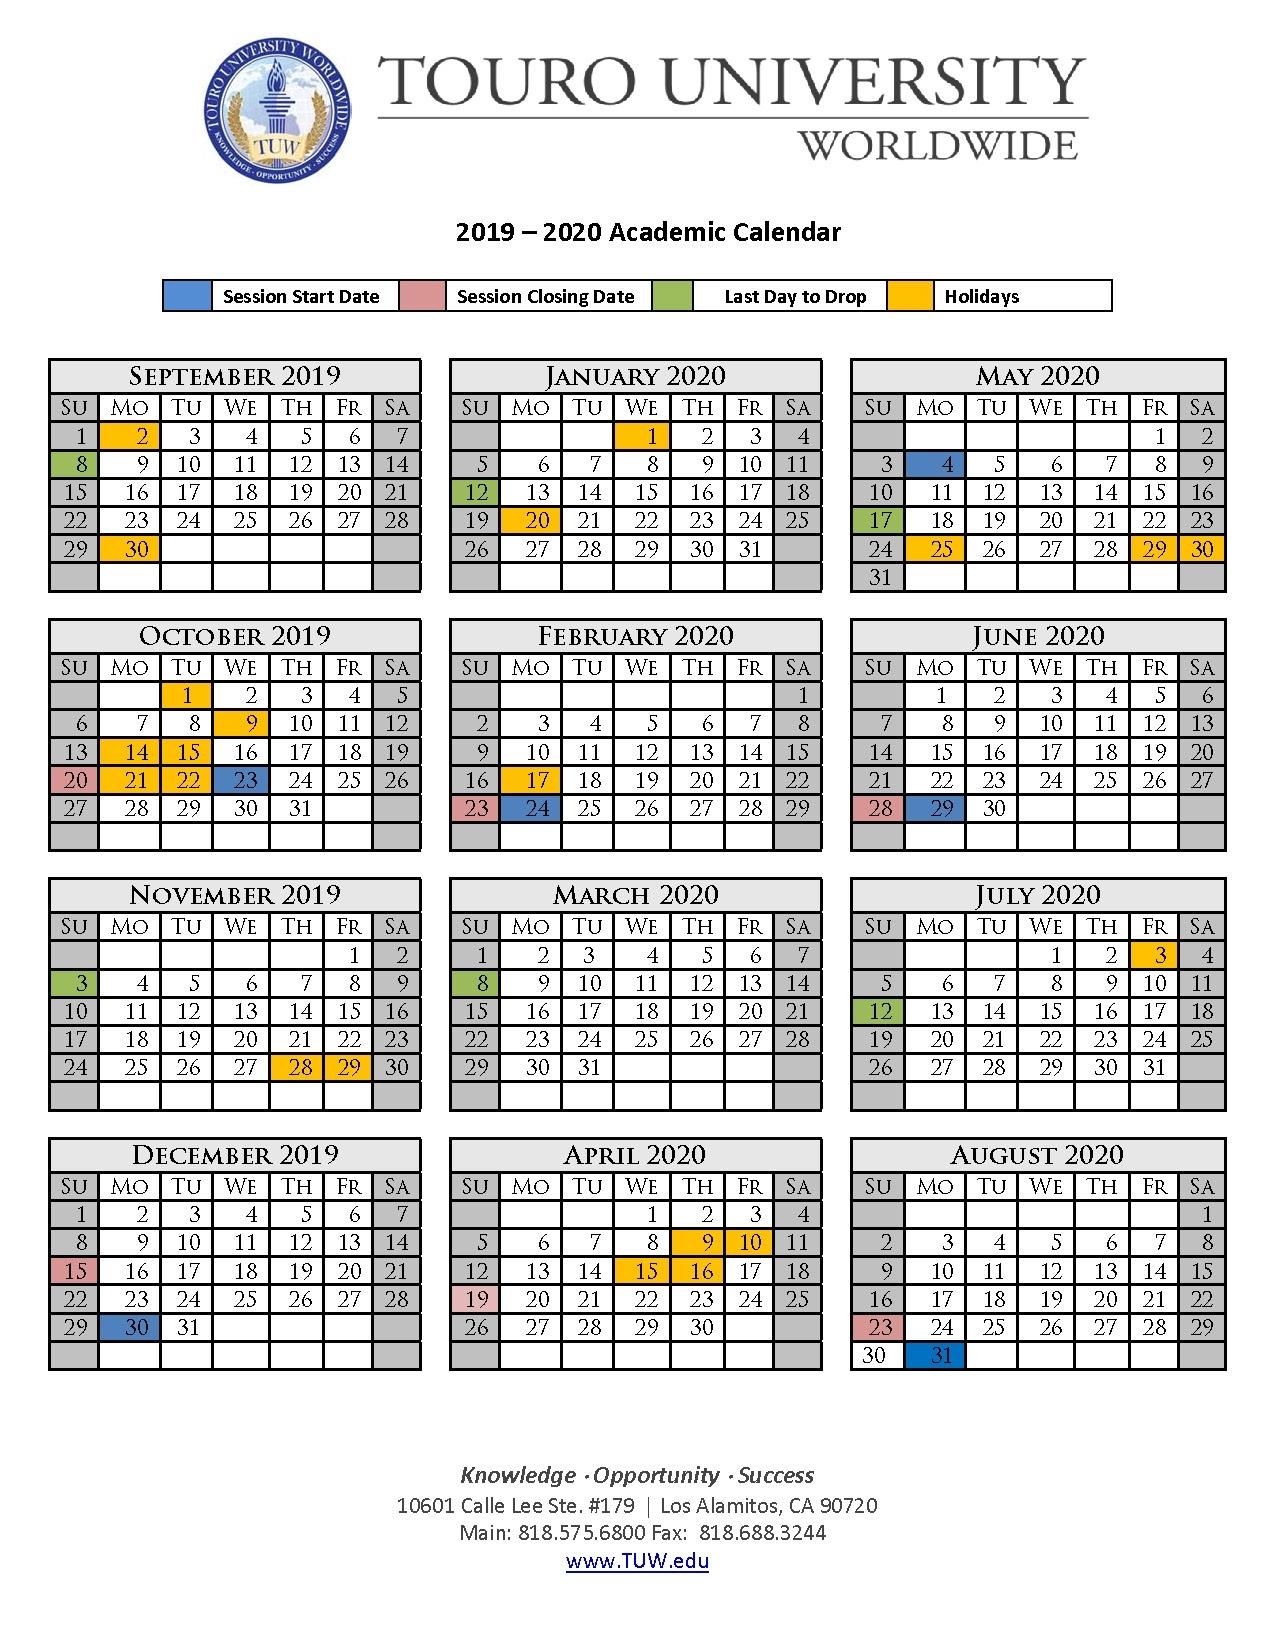 Academic Calendar | Touro University Worldwide